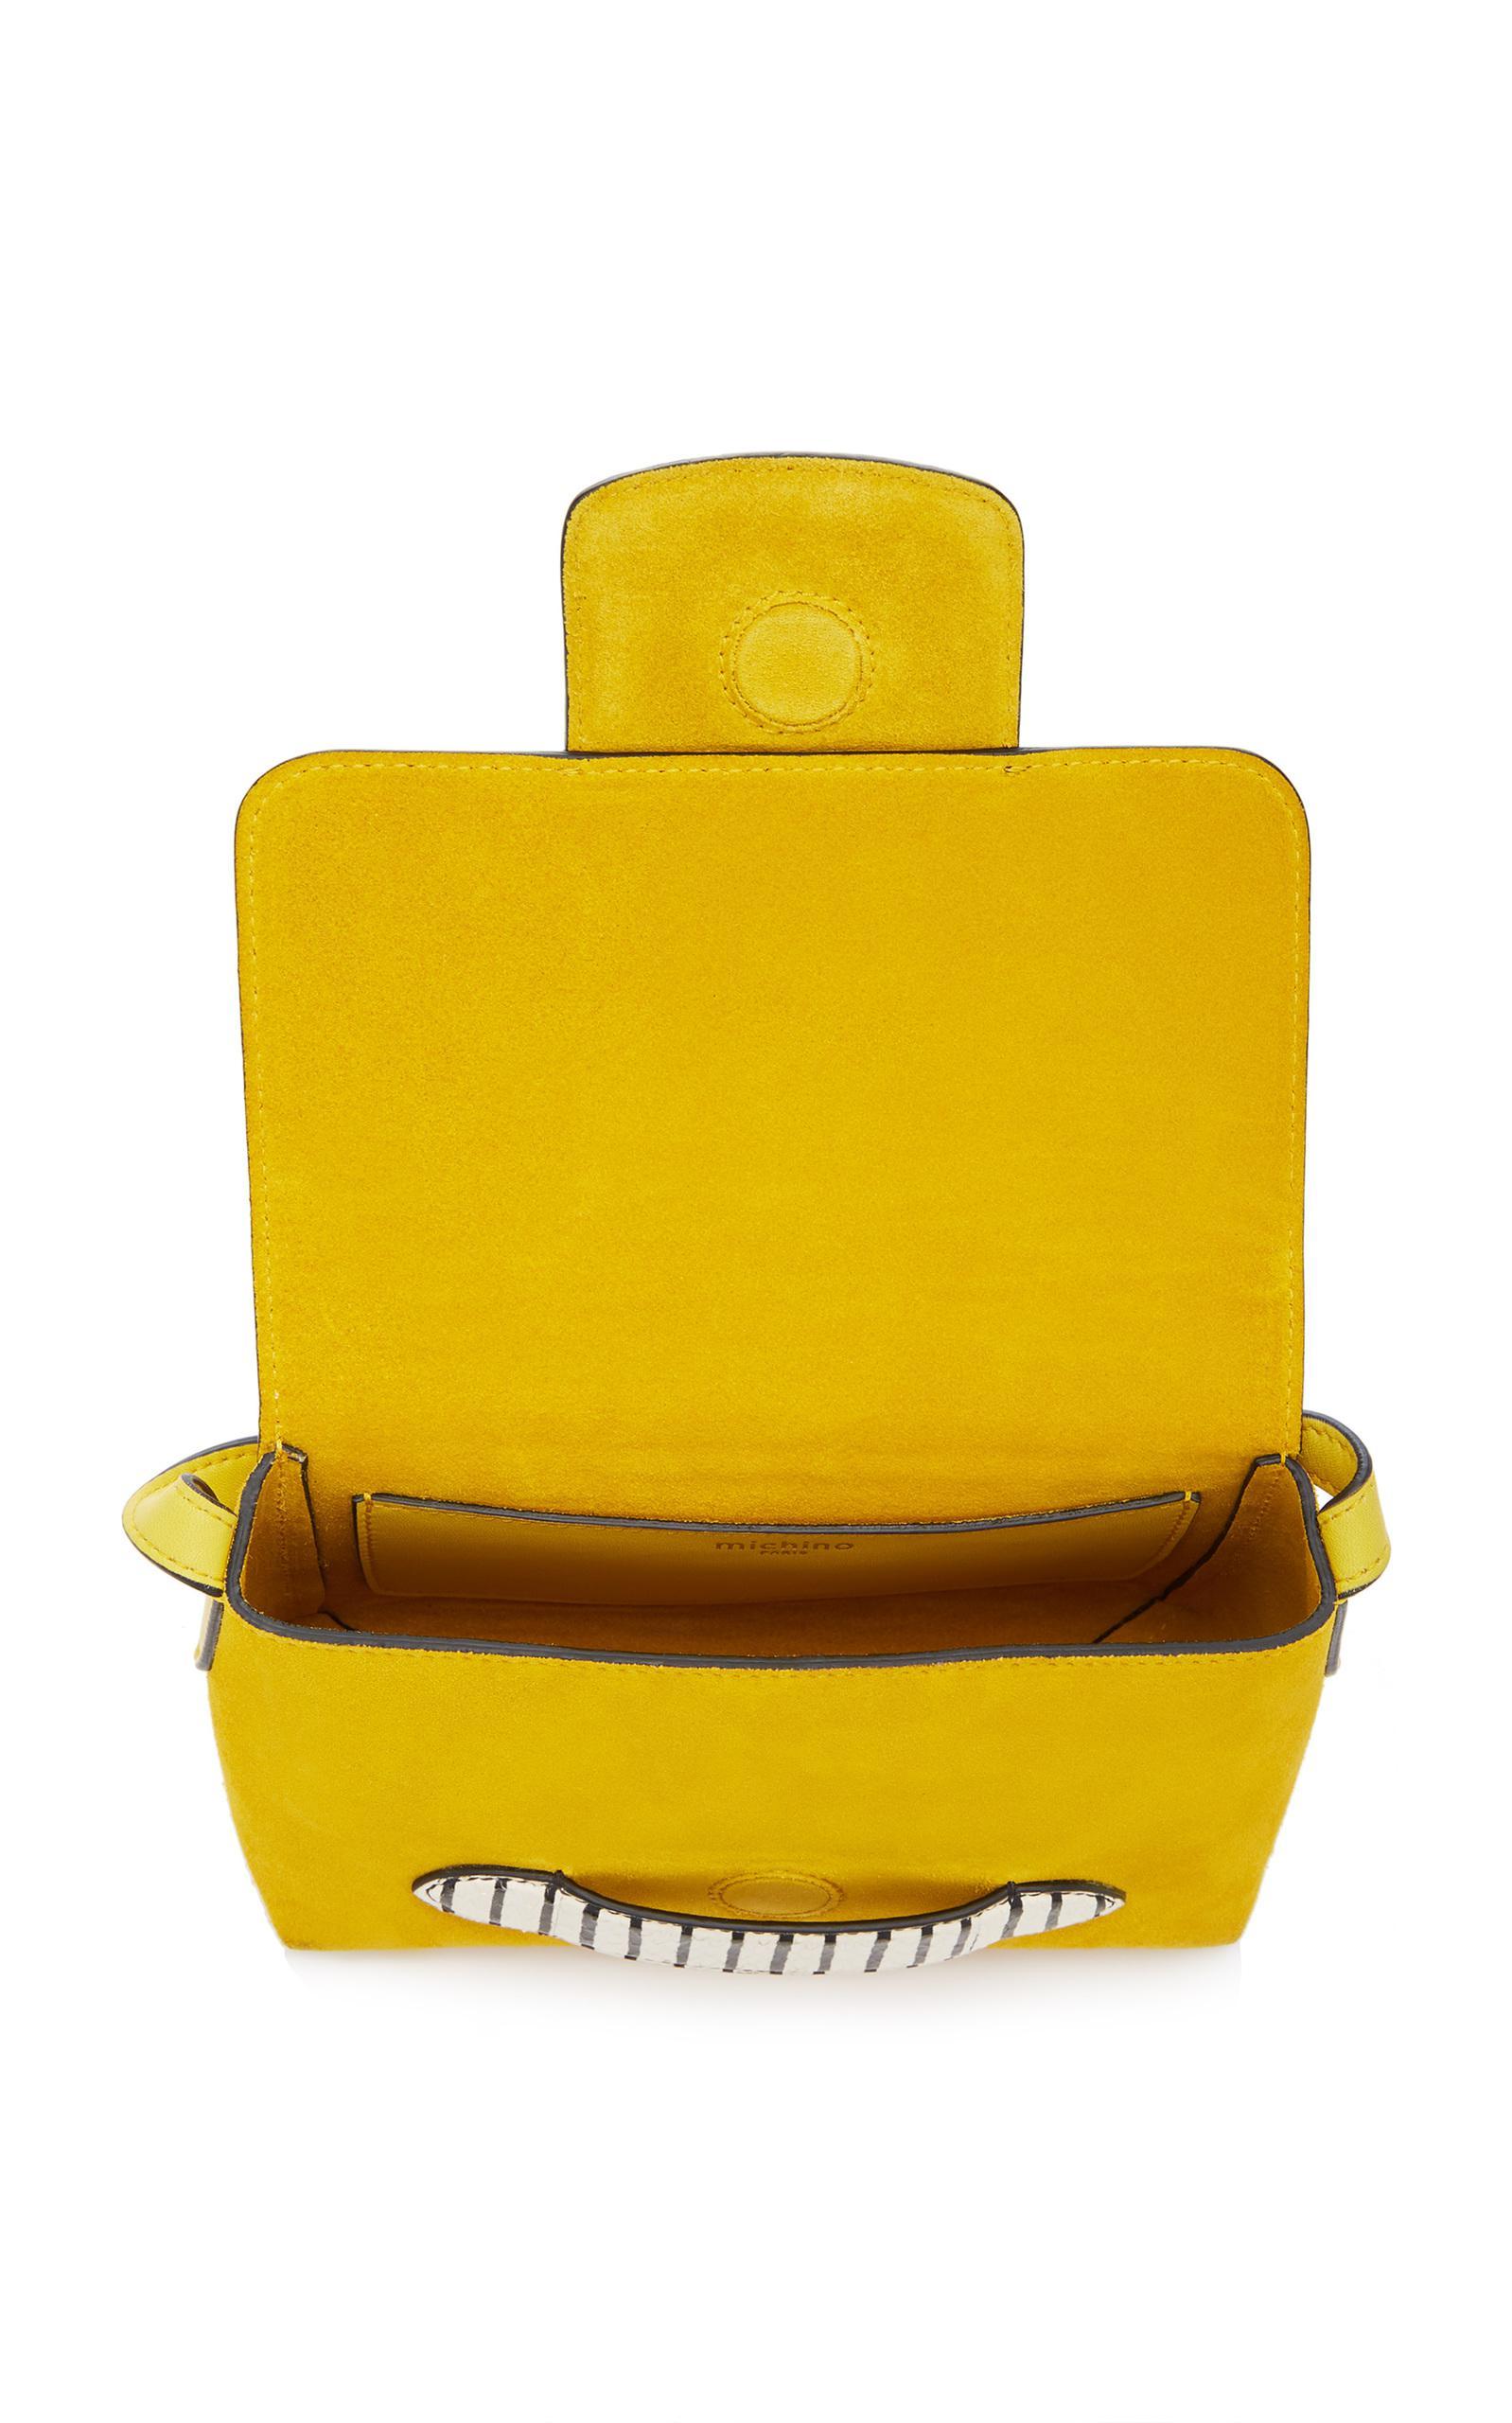 Michino Paris Leather Phedra Crossbody in Yellow